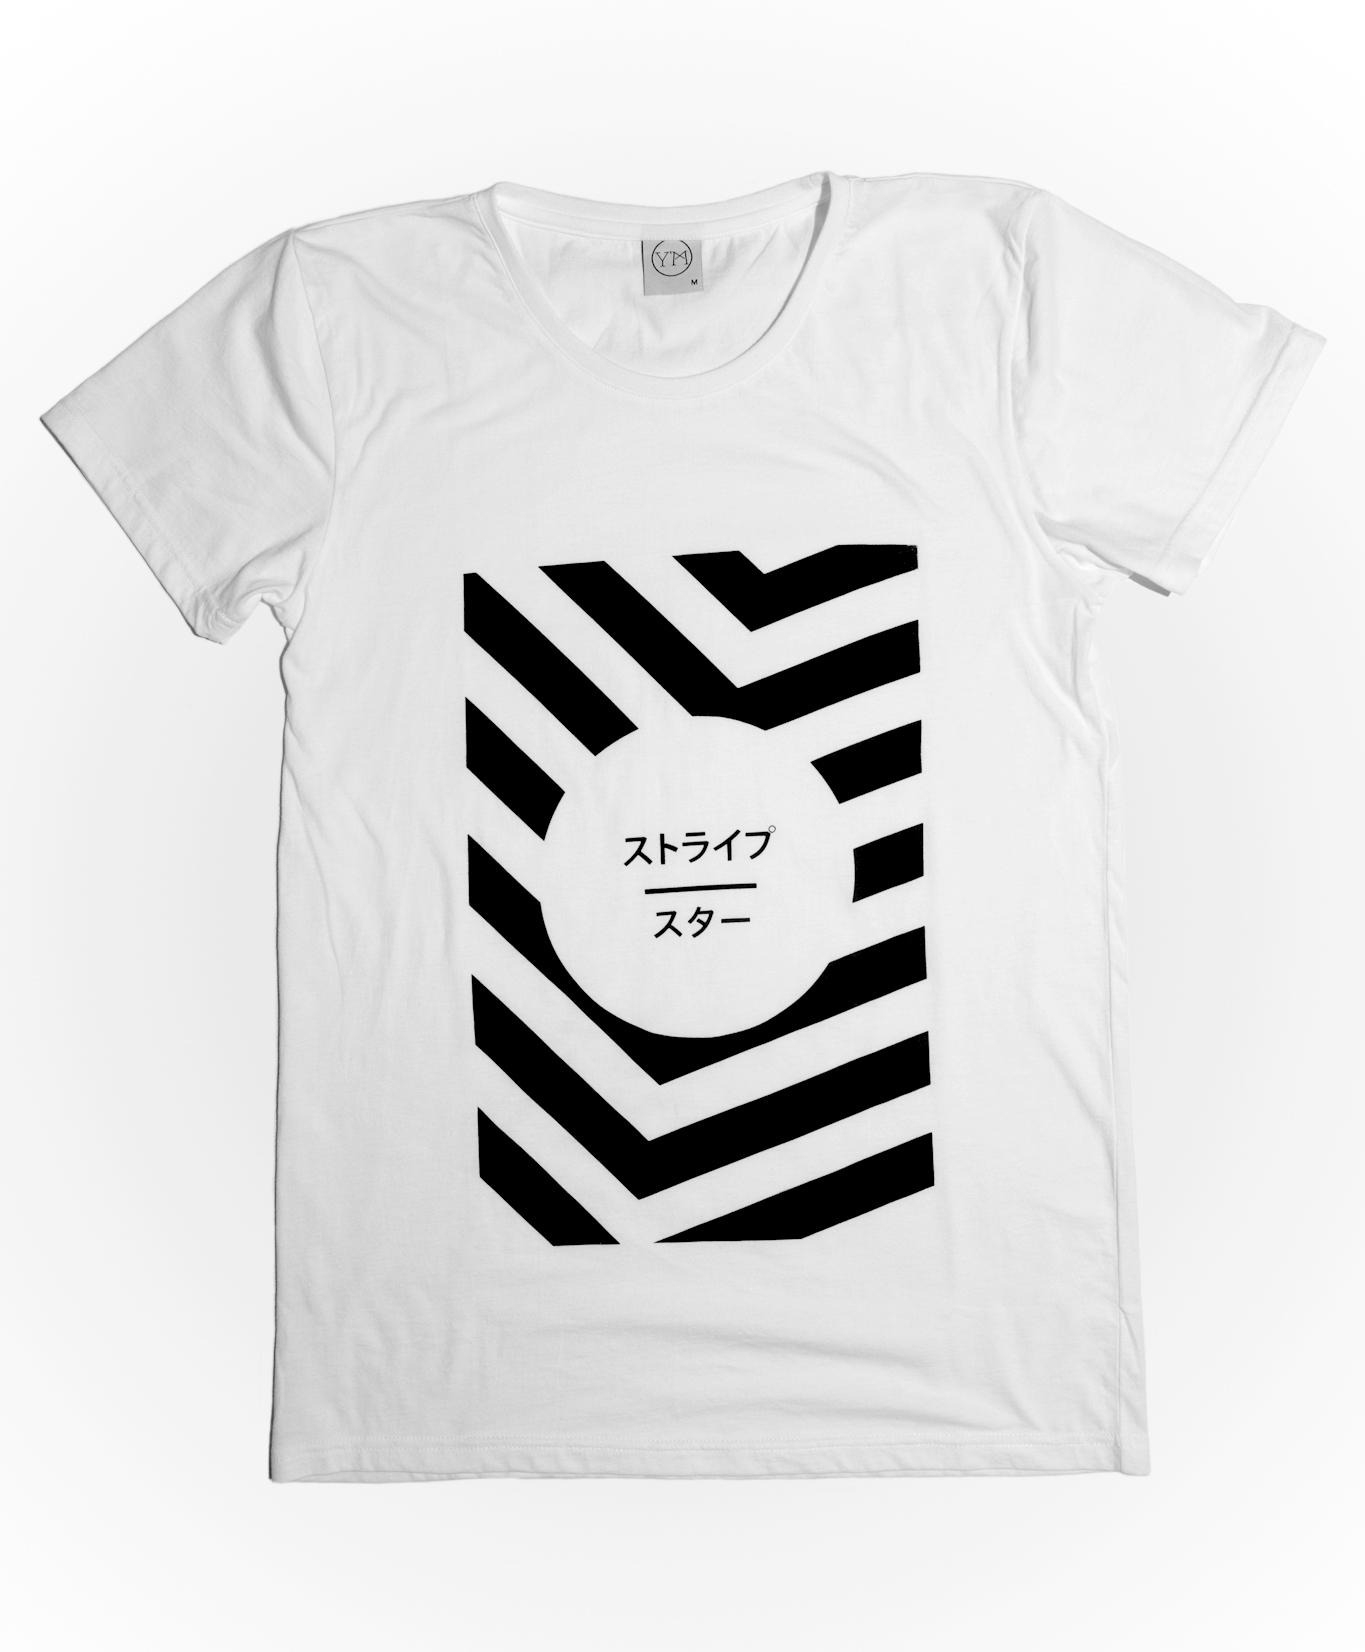 stripes_white02